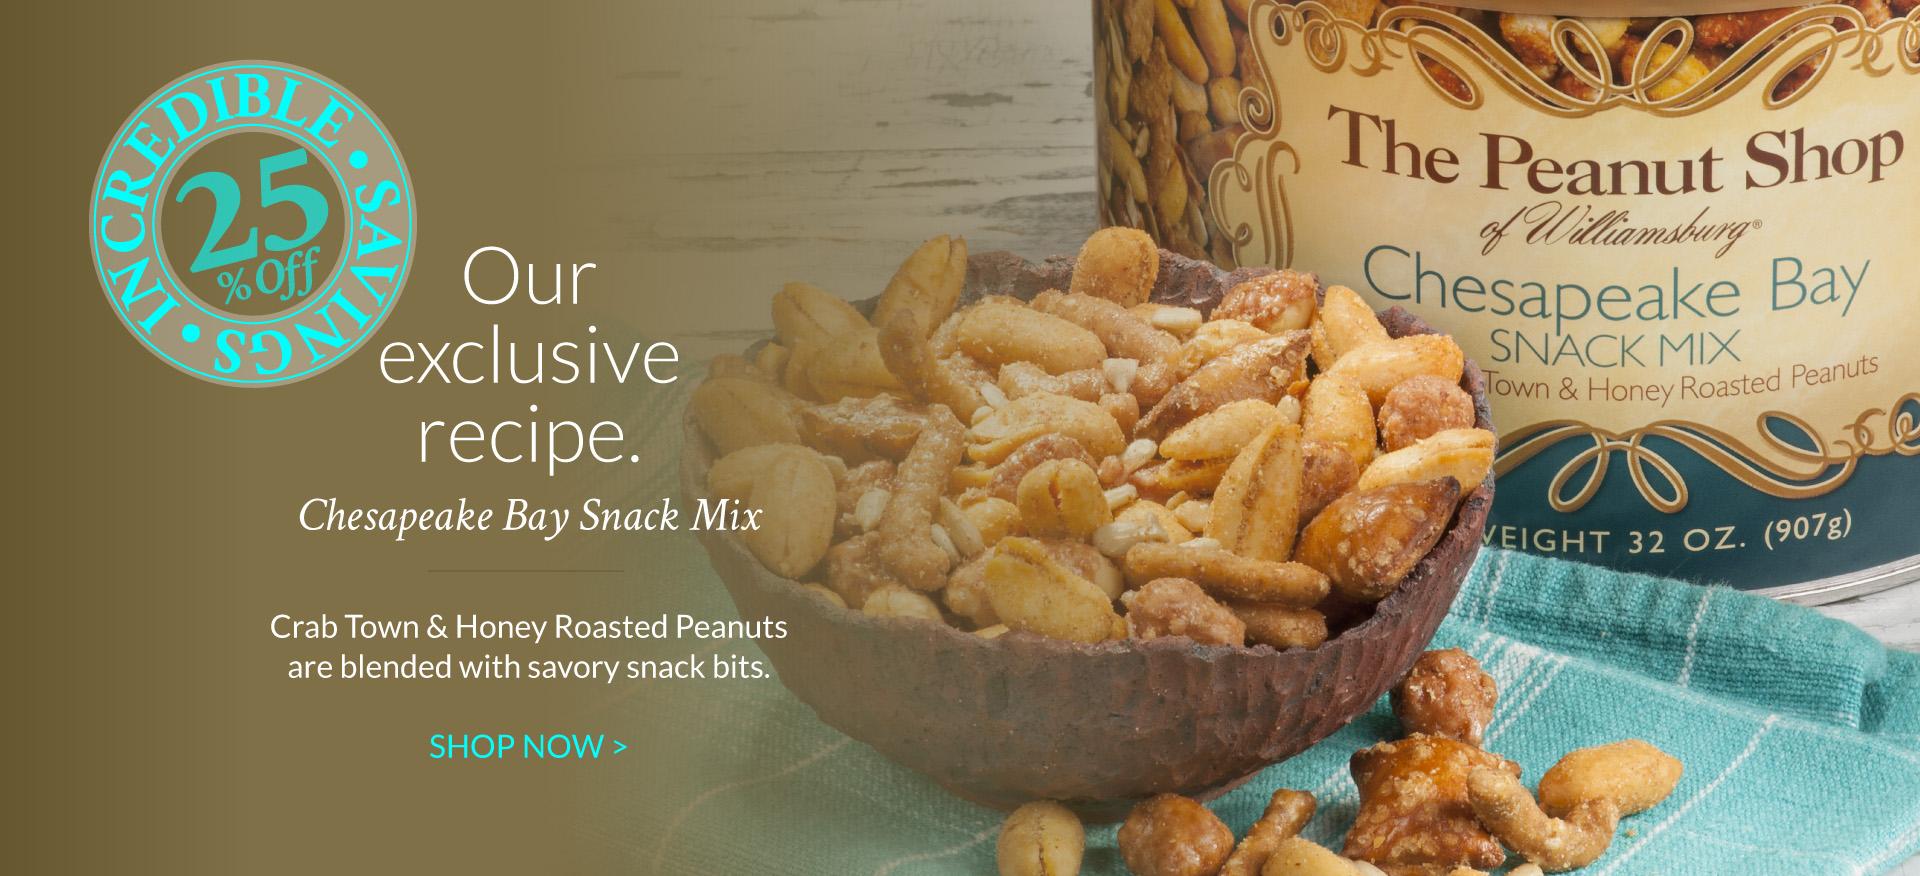 Chesapeake Bay Snack Mix